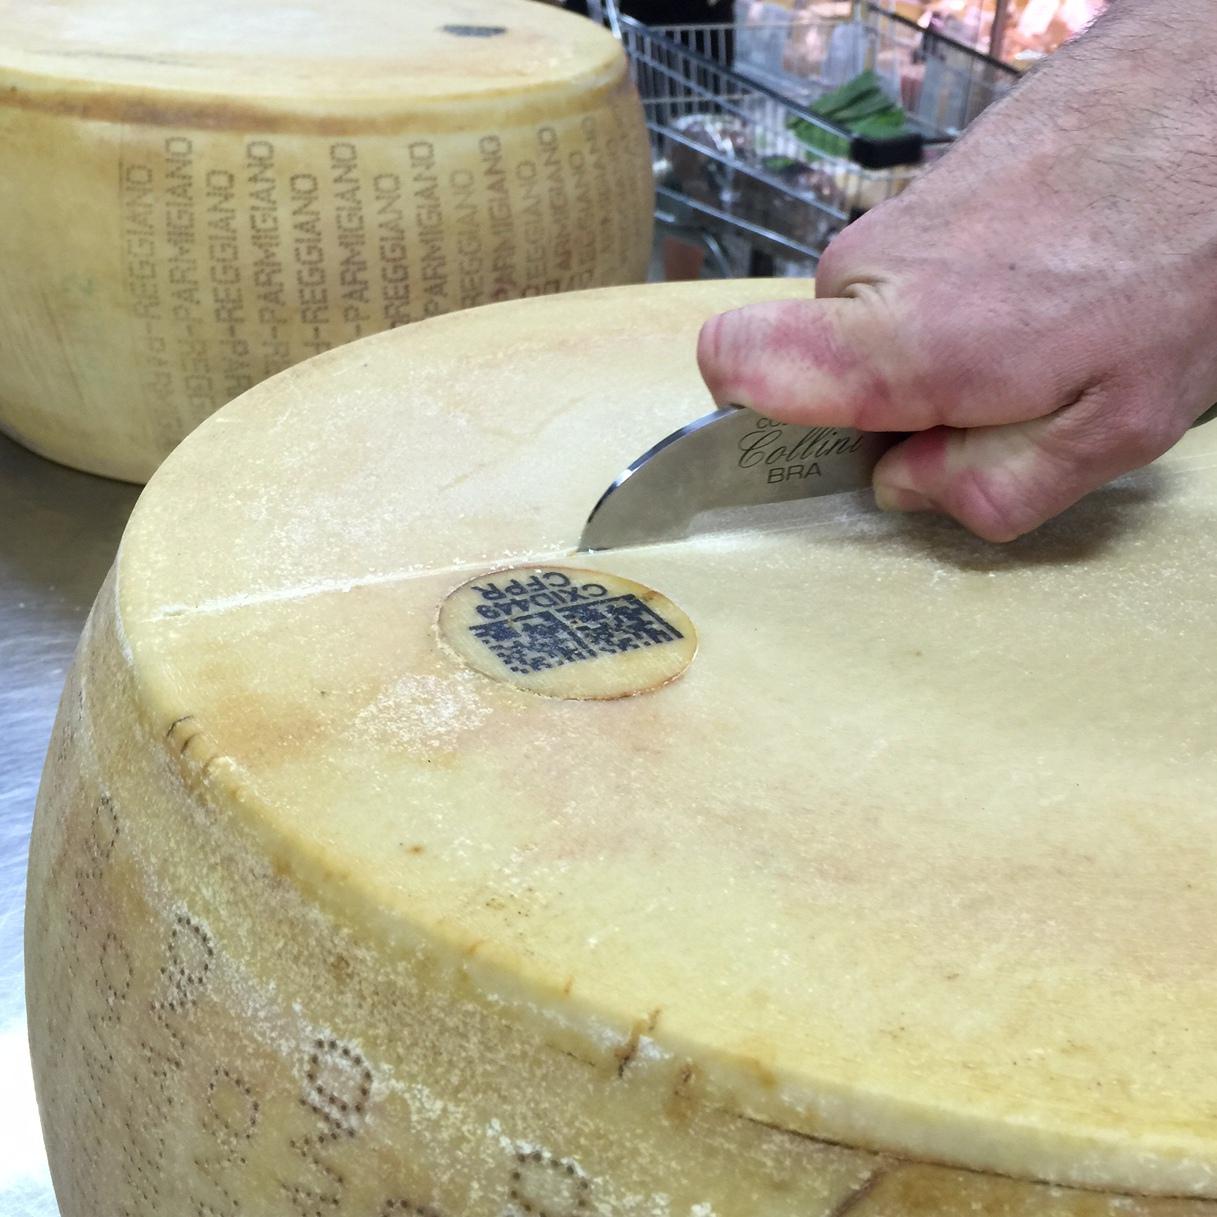 Scoring outer of Parmigiano Reggiano wheel